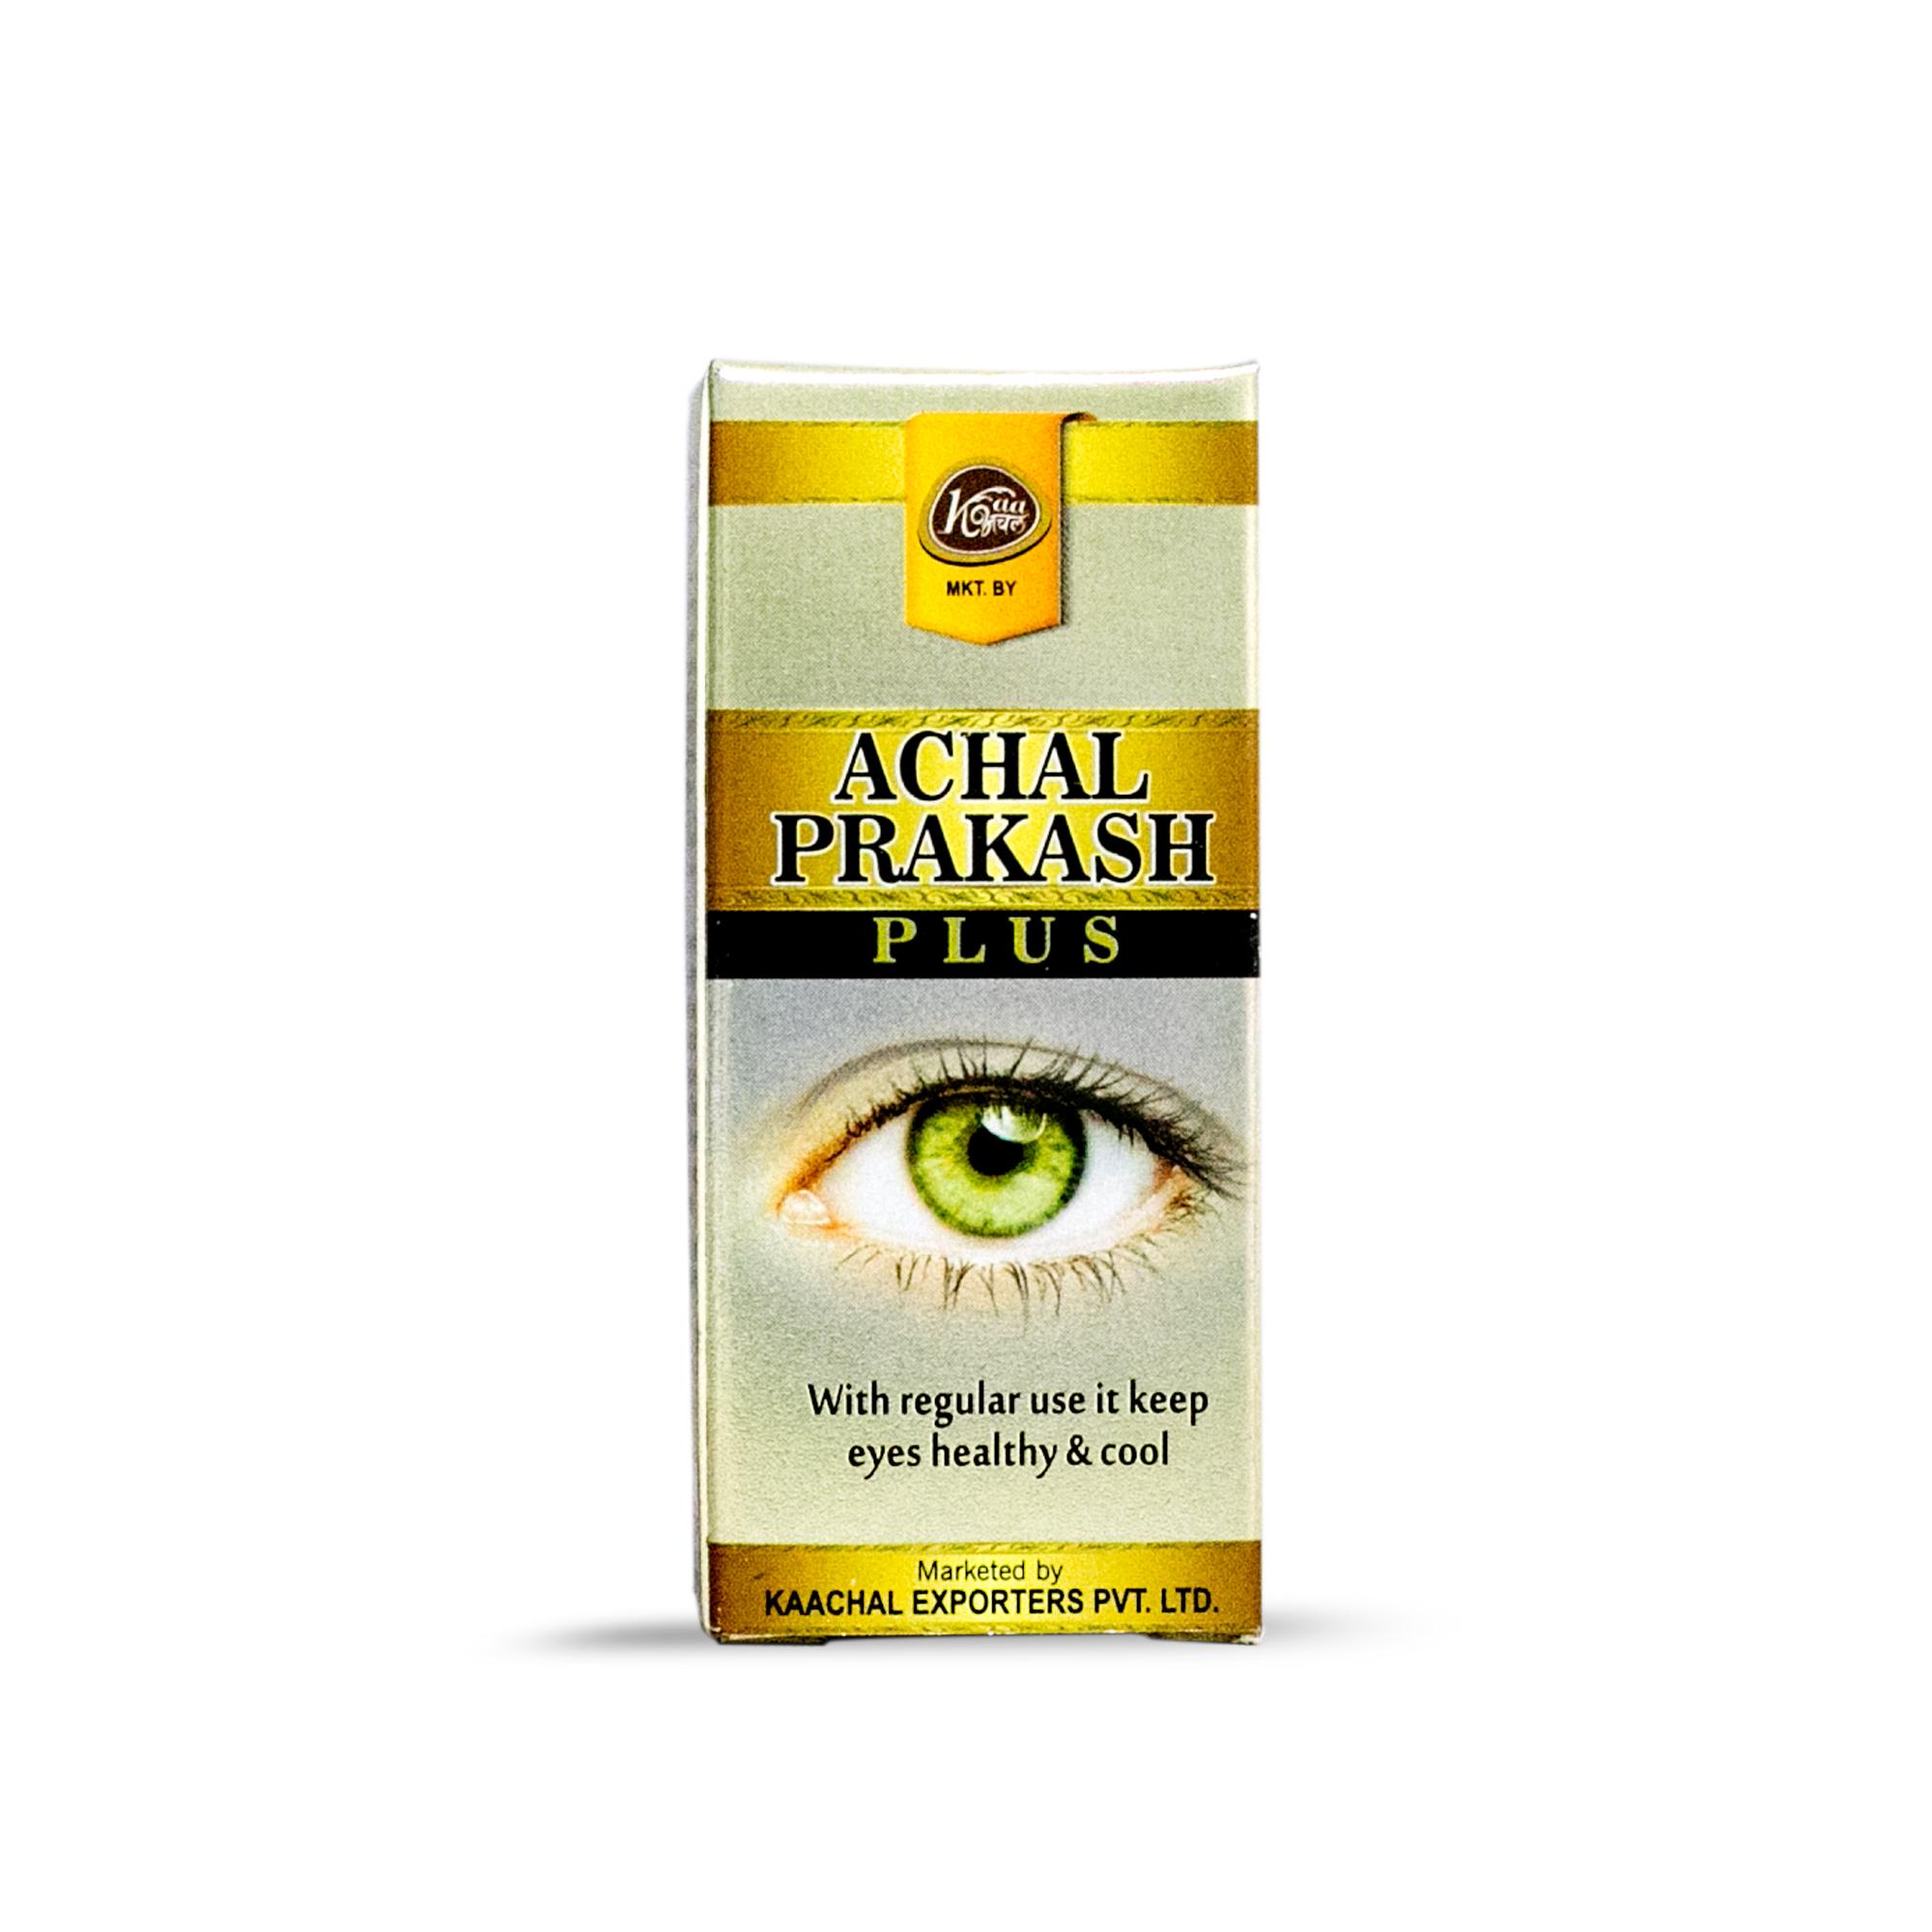 Achal Prakash Plus Eye Drops